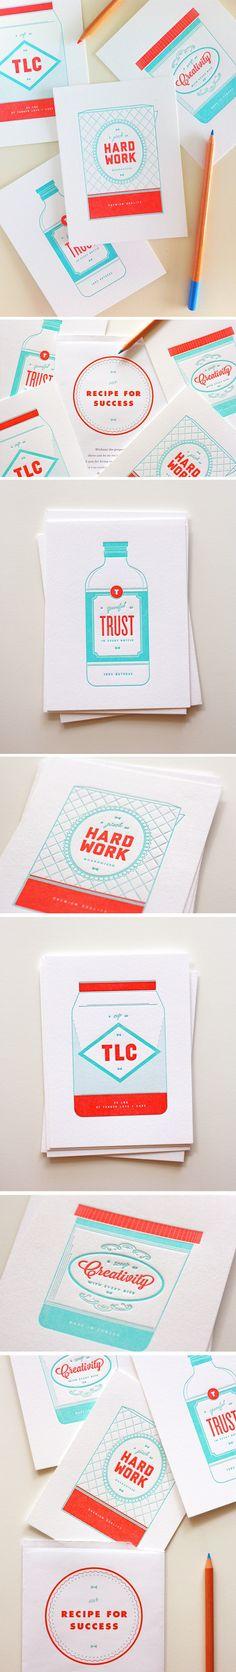 Recipe for Success Series One Plus One Design . Recipe for Success Series One Plus One Design in Our Work Web Design, Book Design, Layout Design, Print Design, Creative Logo, Creative Design, Graphic Design Typography, Graphic Design Illustration, Stationery Design